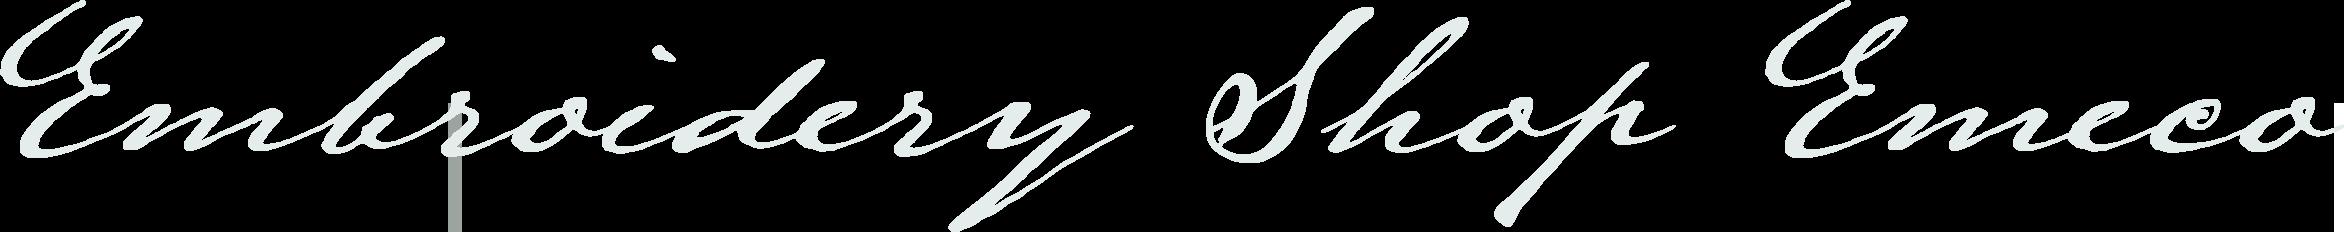 Embroidery Shop Emeco